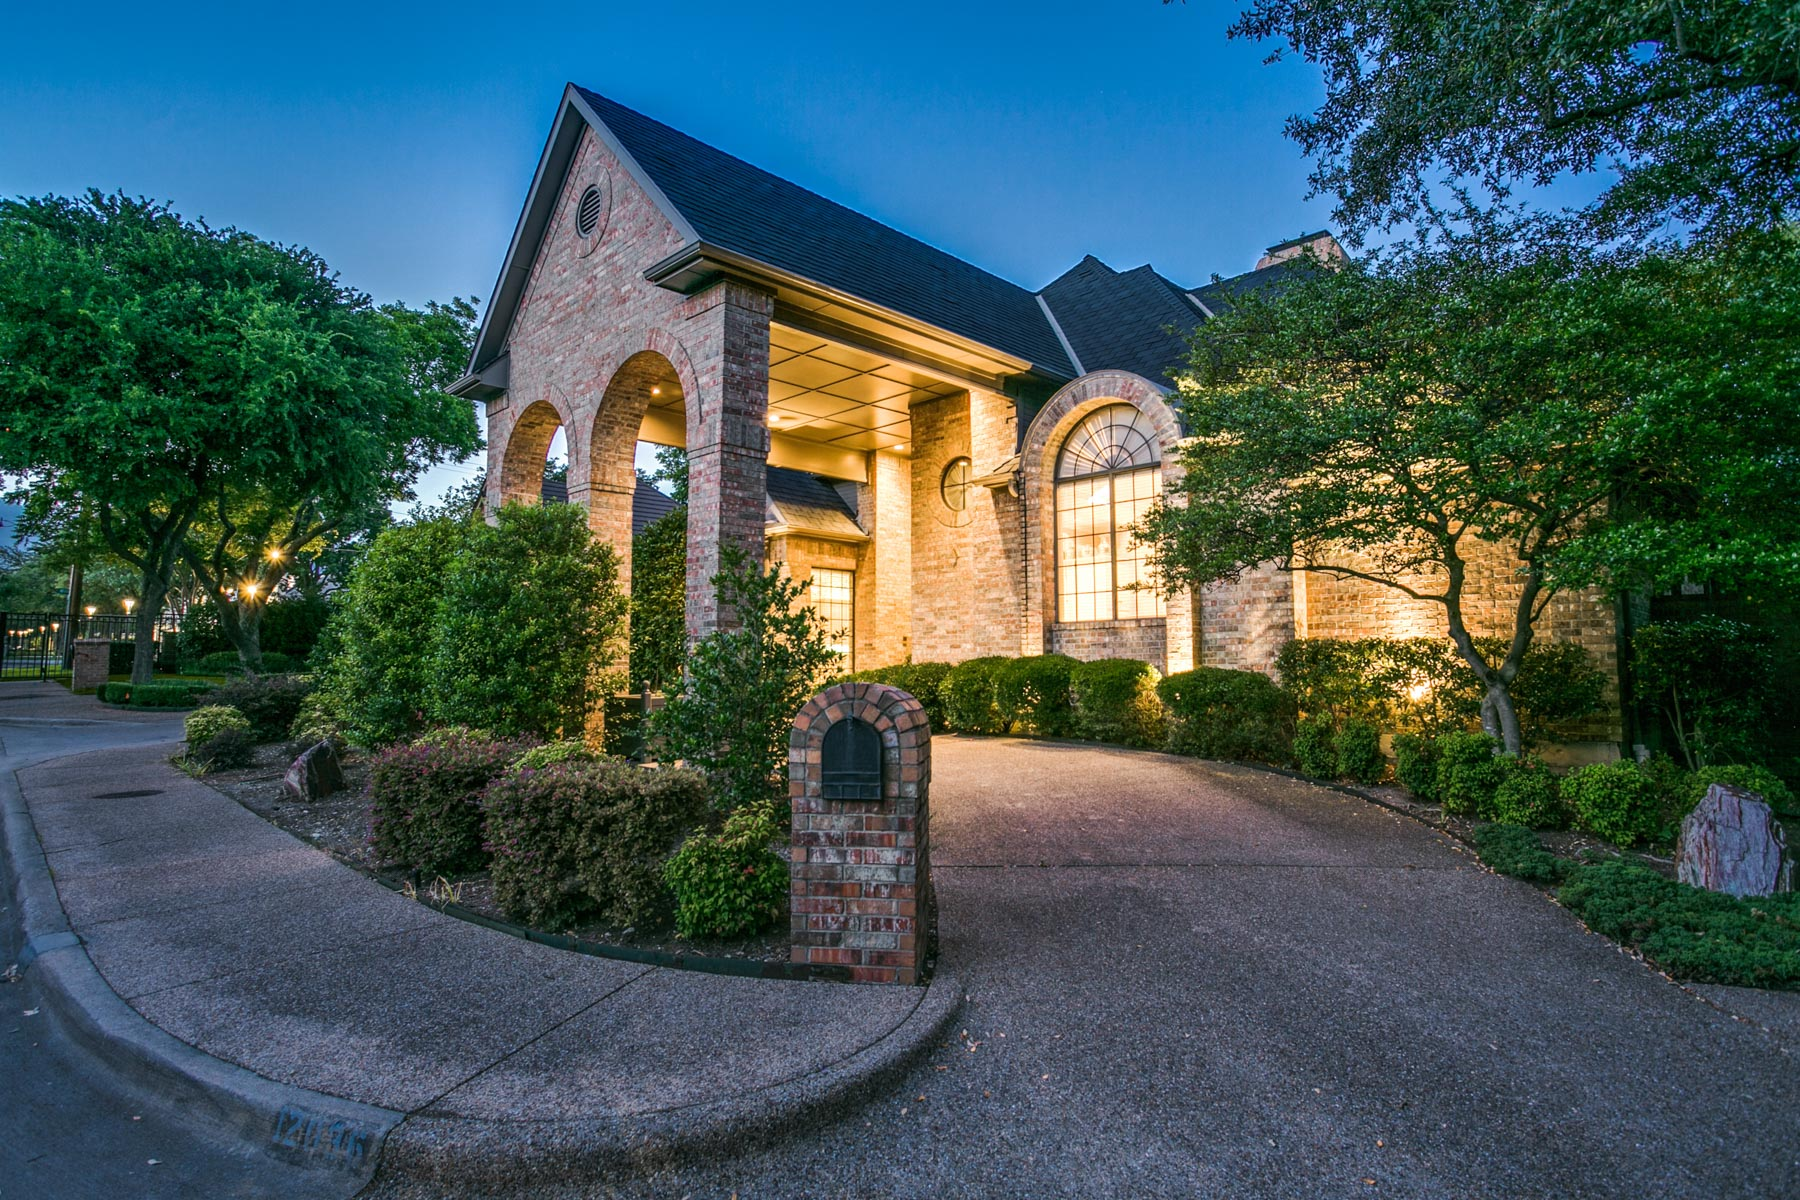 独户住宅 为 销售 在 Lovely Opportunity in Gated Community 12036 Excelsior Way 达拉斯, 得克萨斯州, 75230 美国